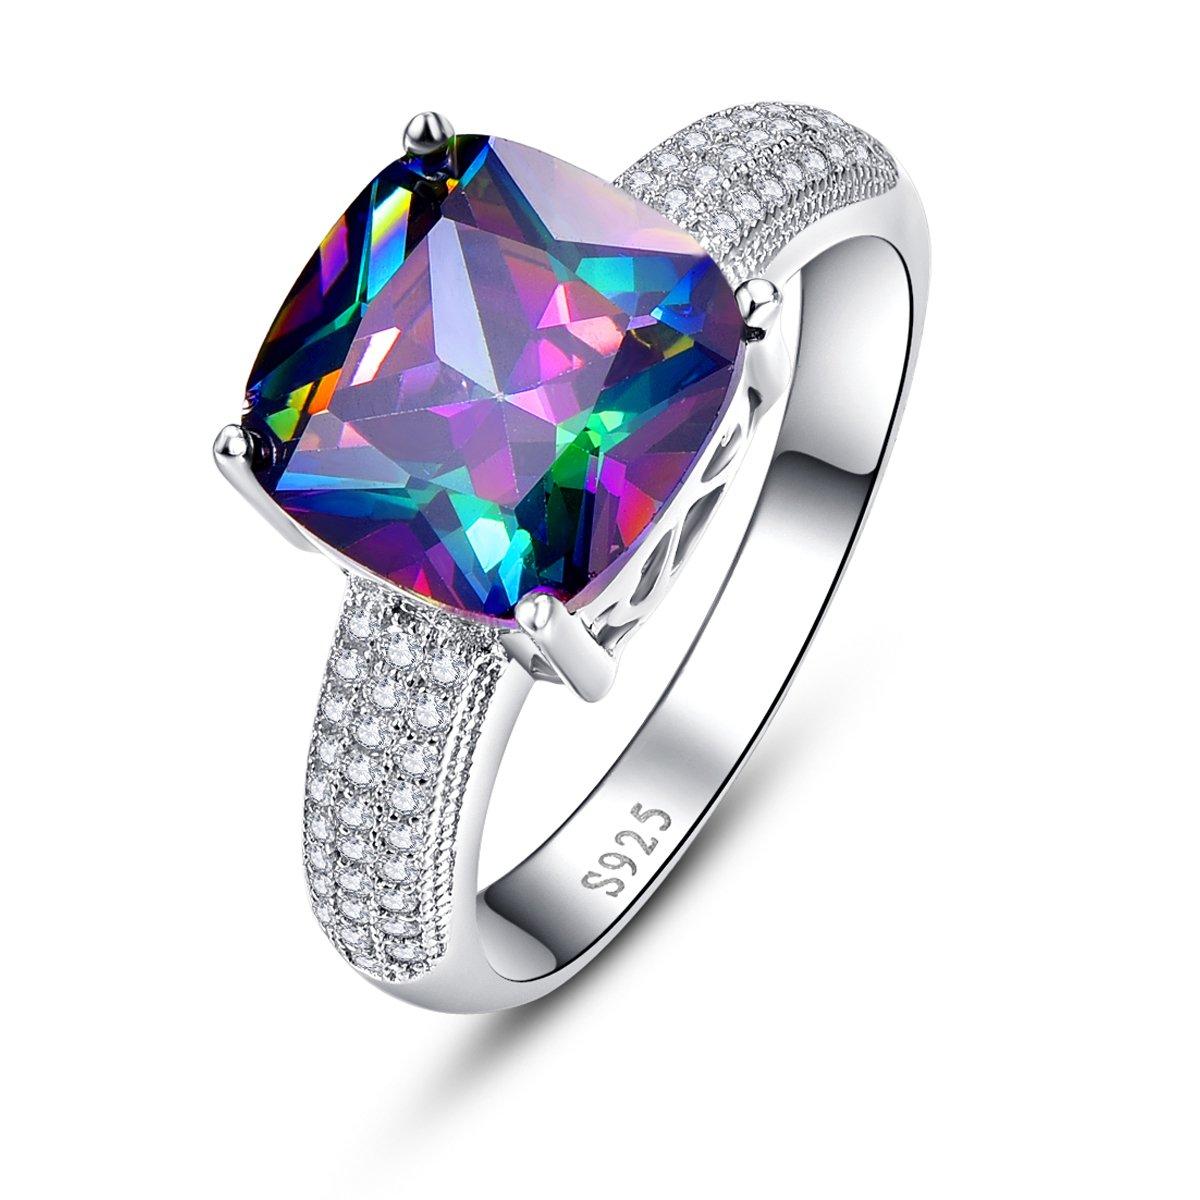 BONLAVIE Created Rainbow Topaz Sterling Silver Anniversary Engagement Ring Jewelry for Women Size 8